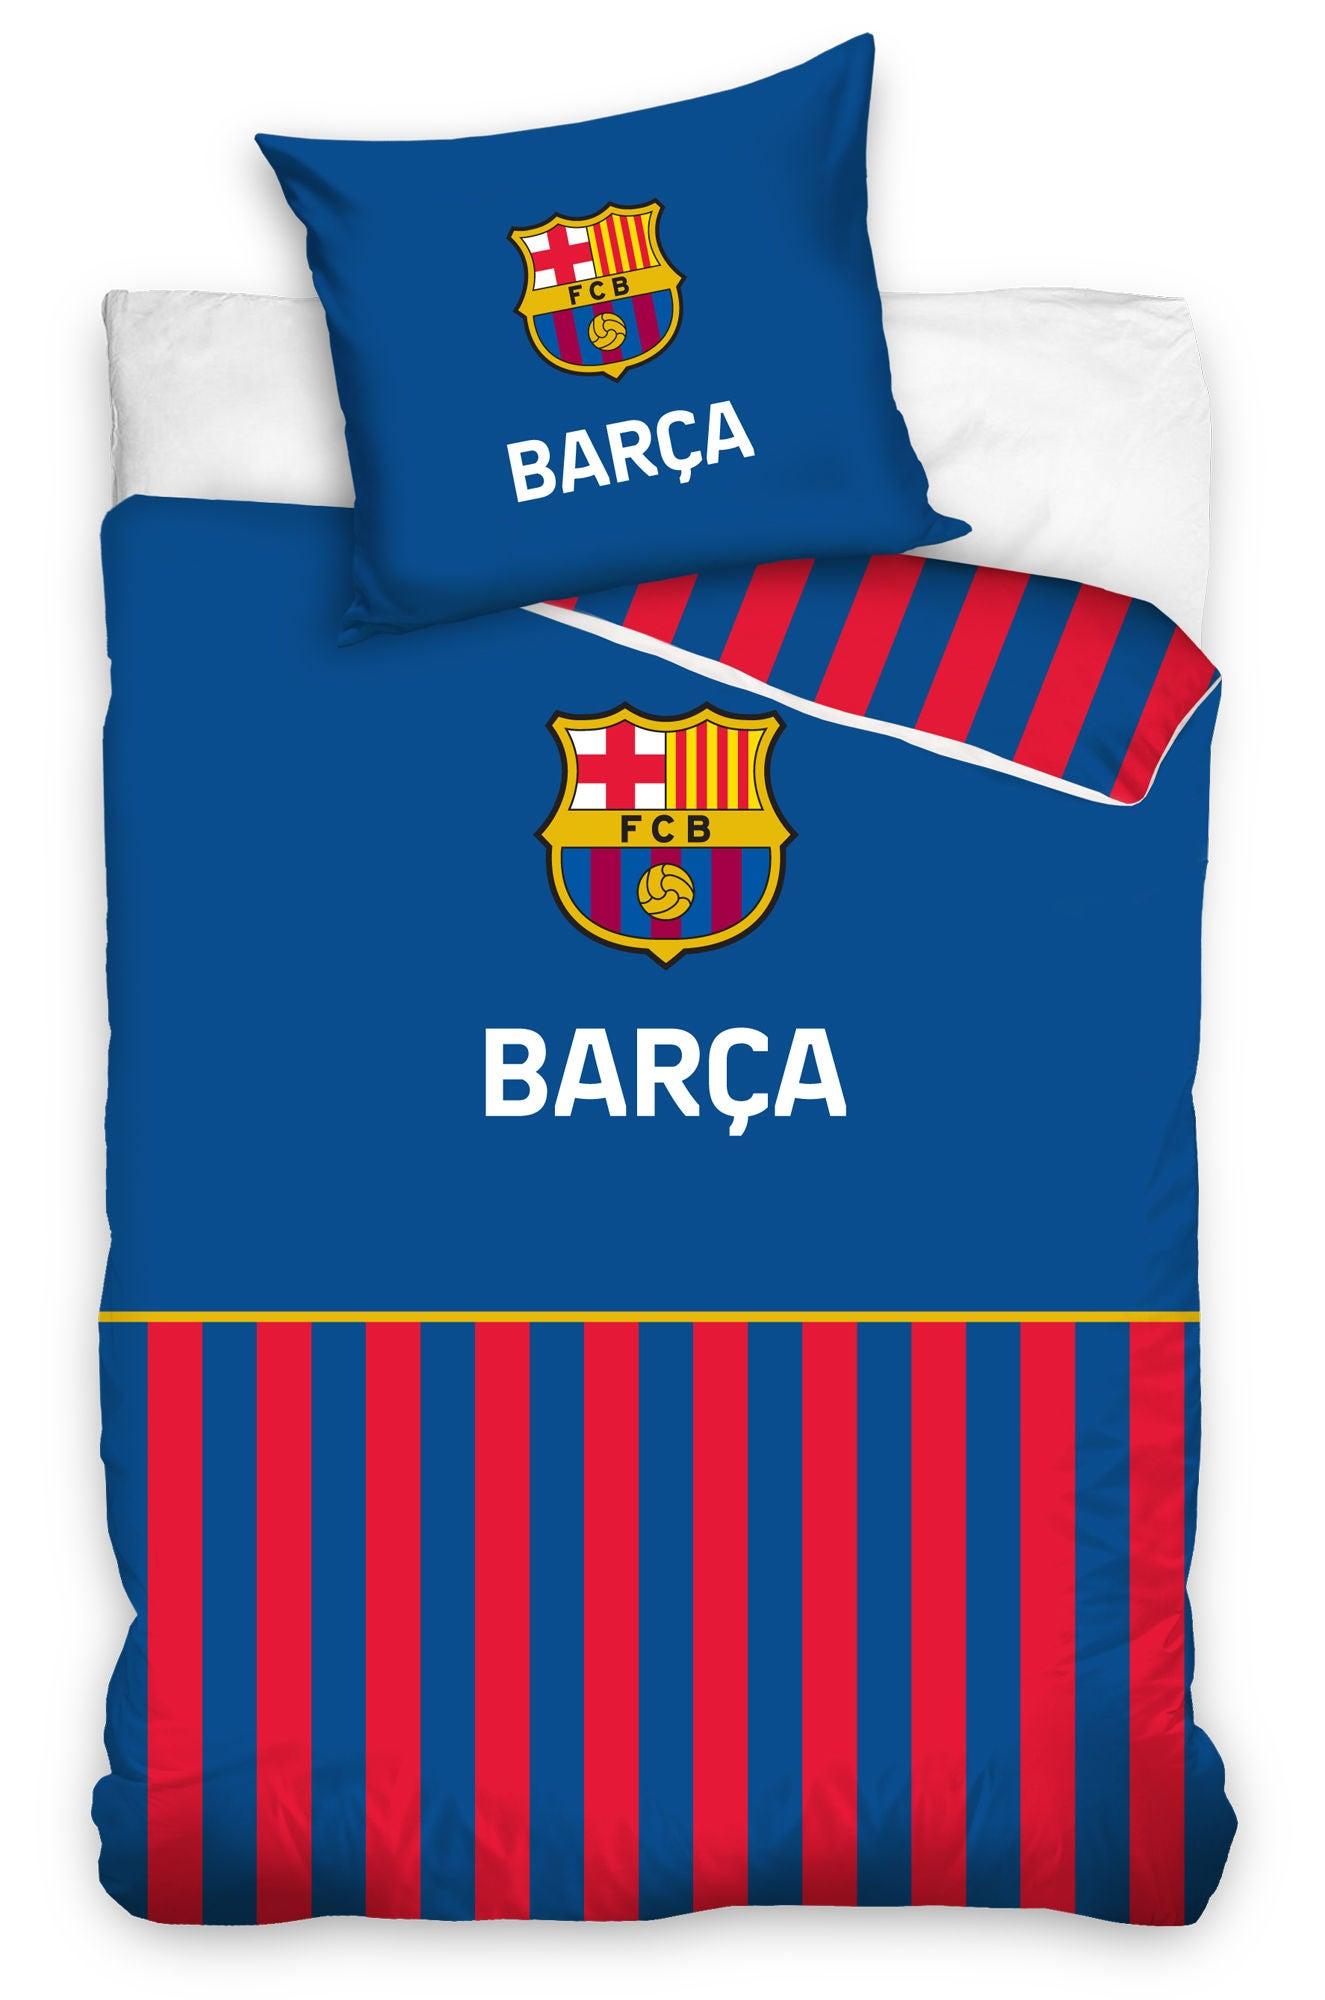 FC Barcelona Påslakanset 150x210 Blå/Röd